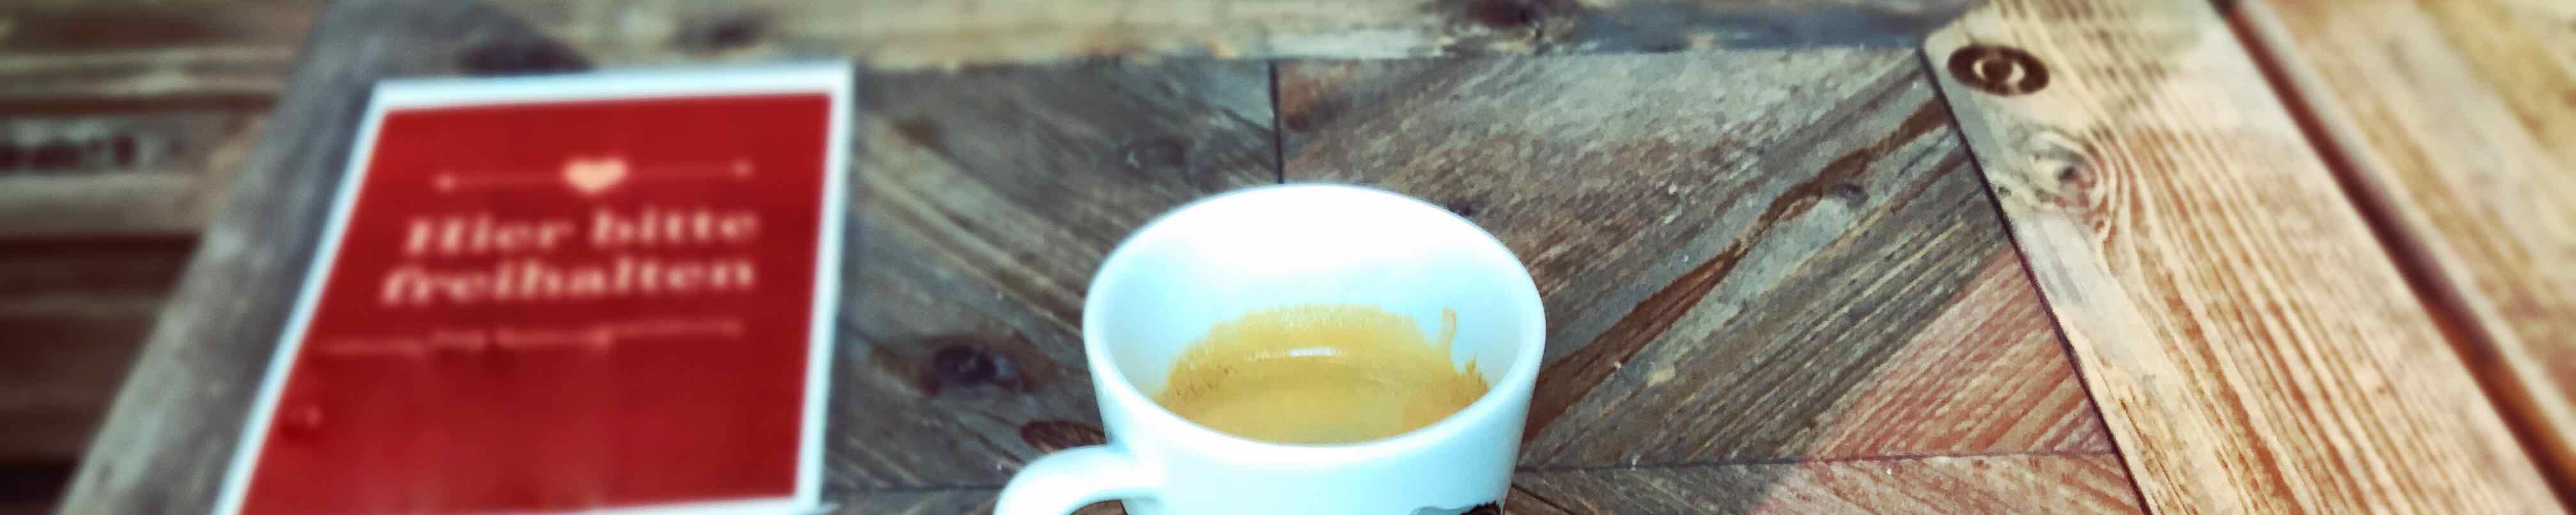 KaffeeZumFreihalten_line_l